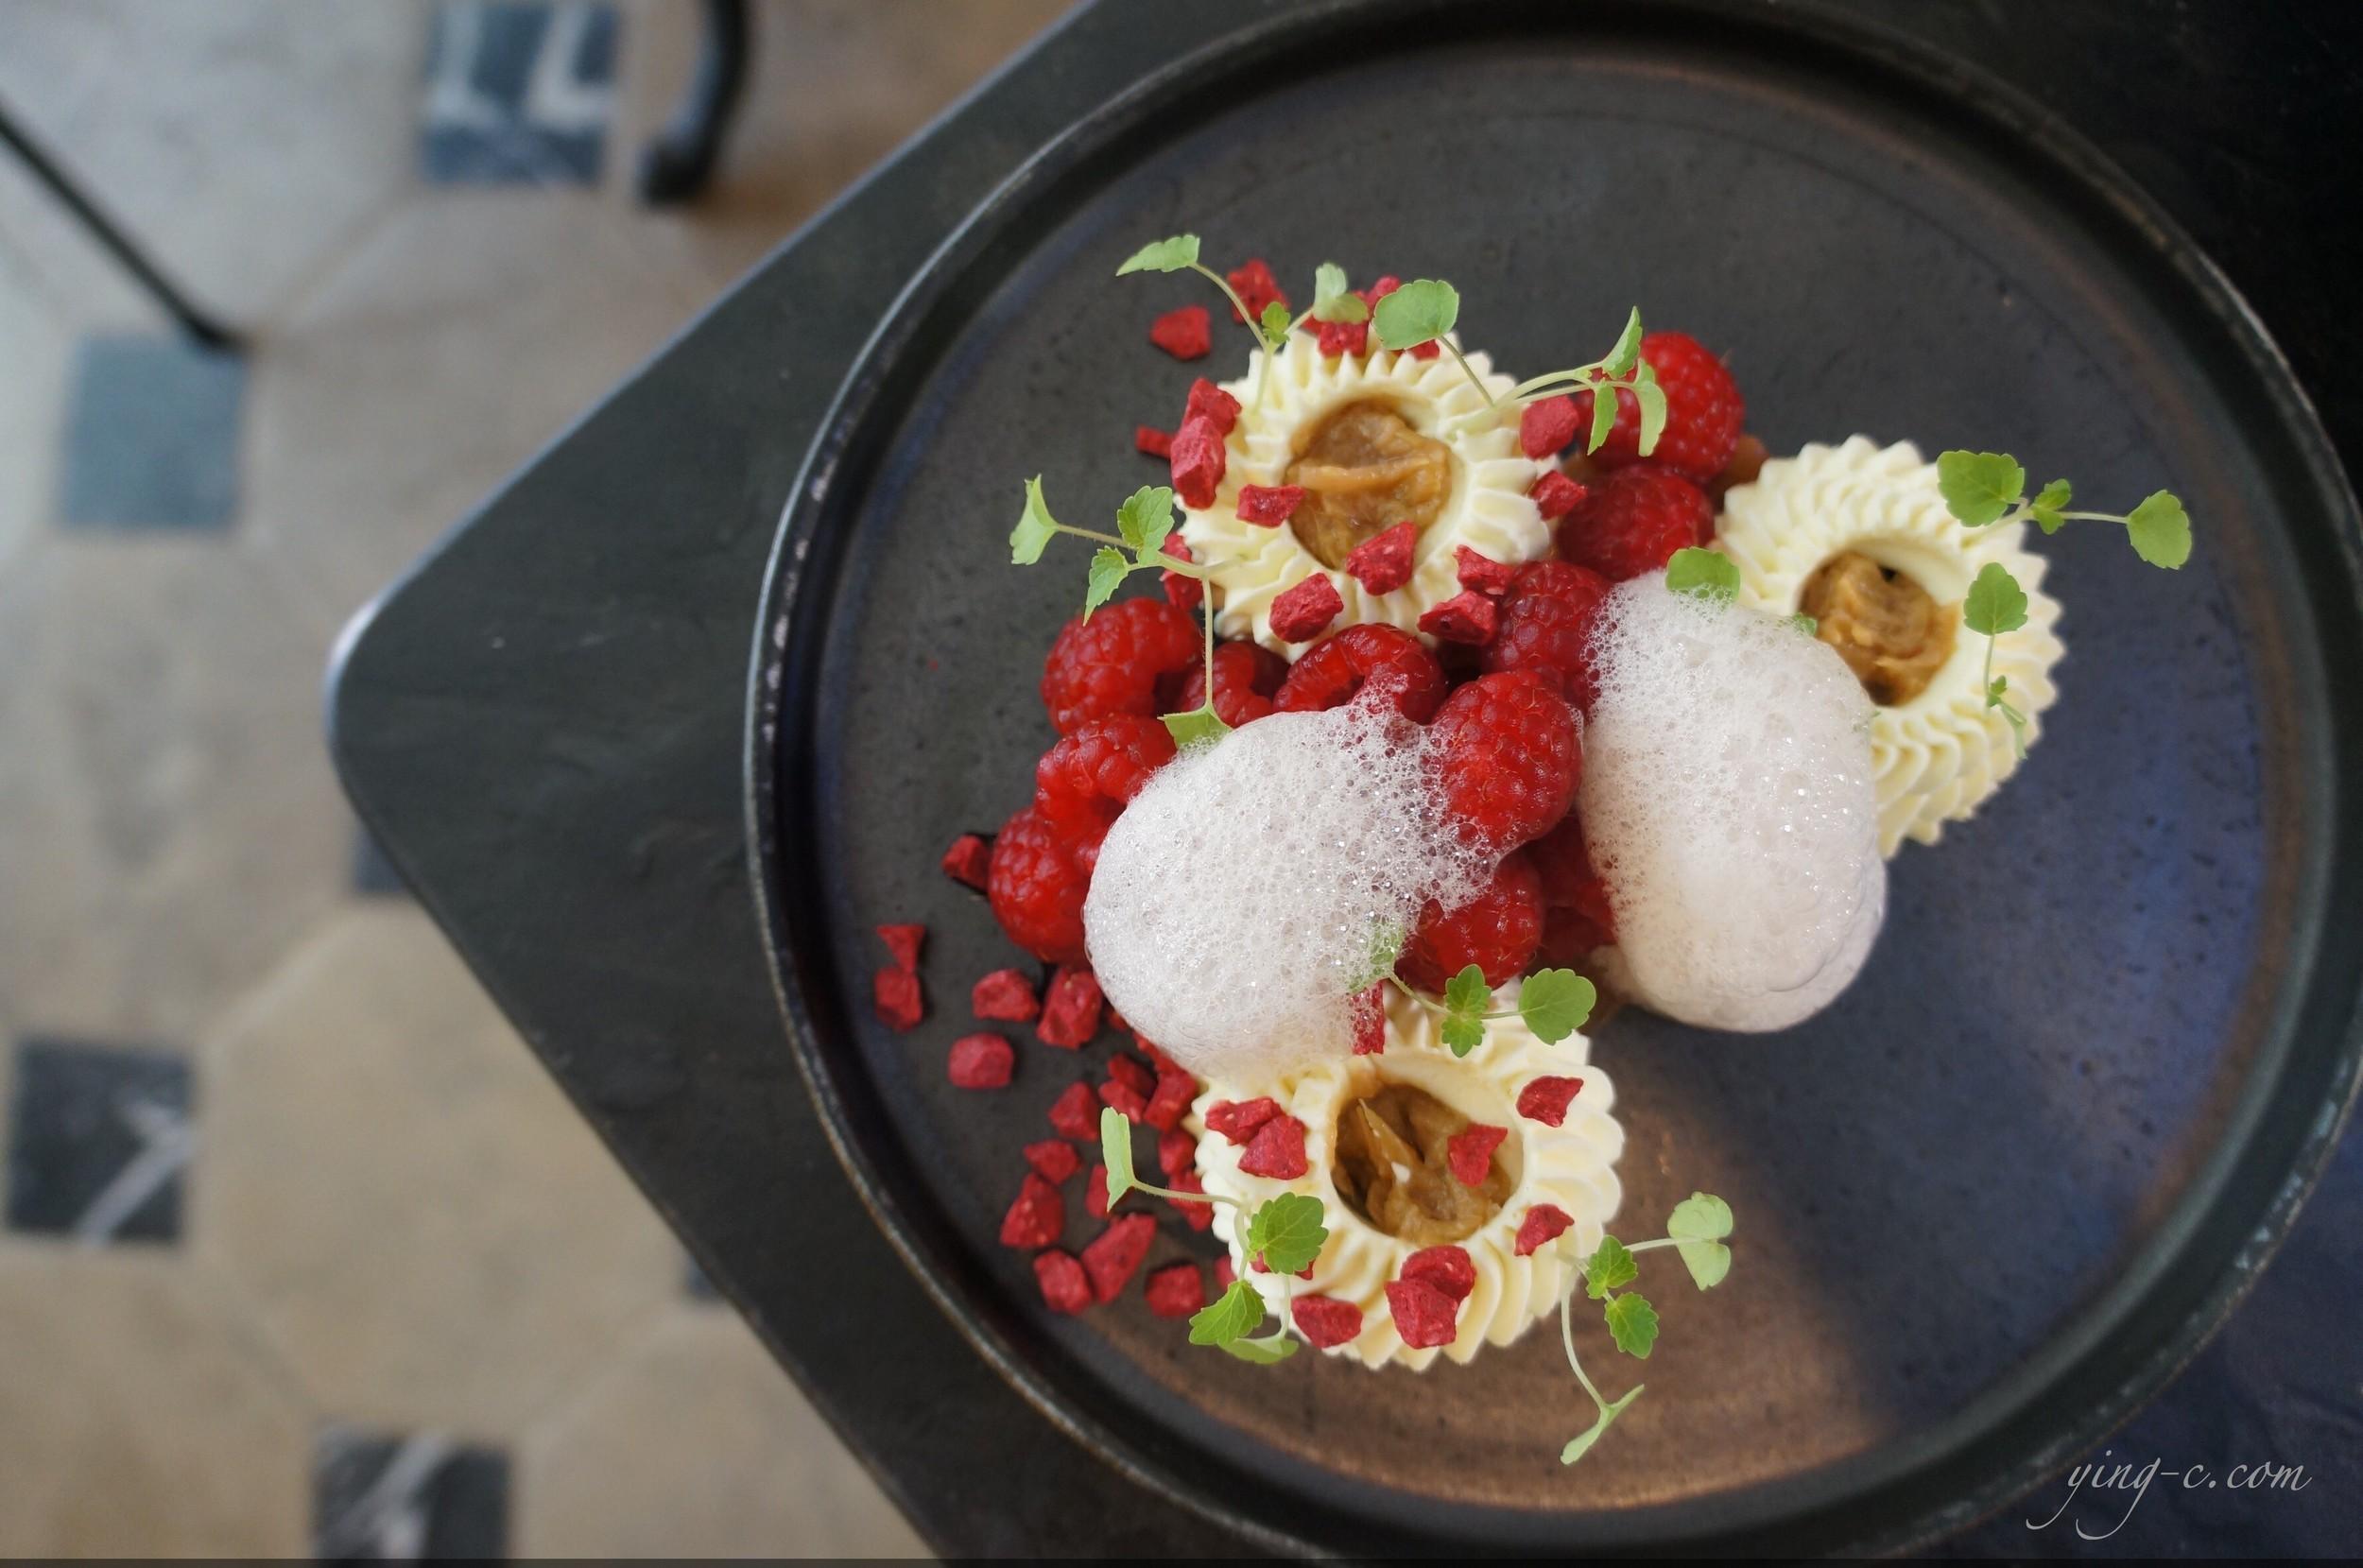 """ Rubarbe croquante et confite, verveine, framboise marinée et citron vert "" (rubarb confit and crisp, verbena, marinated raspberry and lime)"